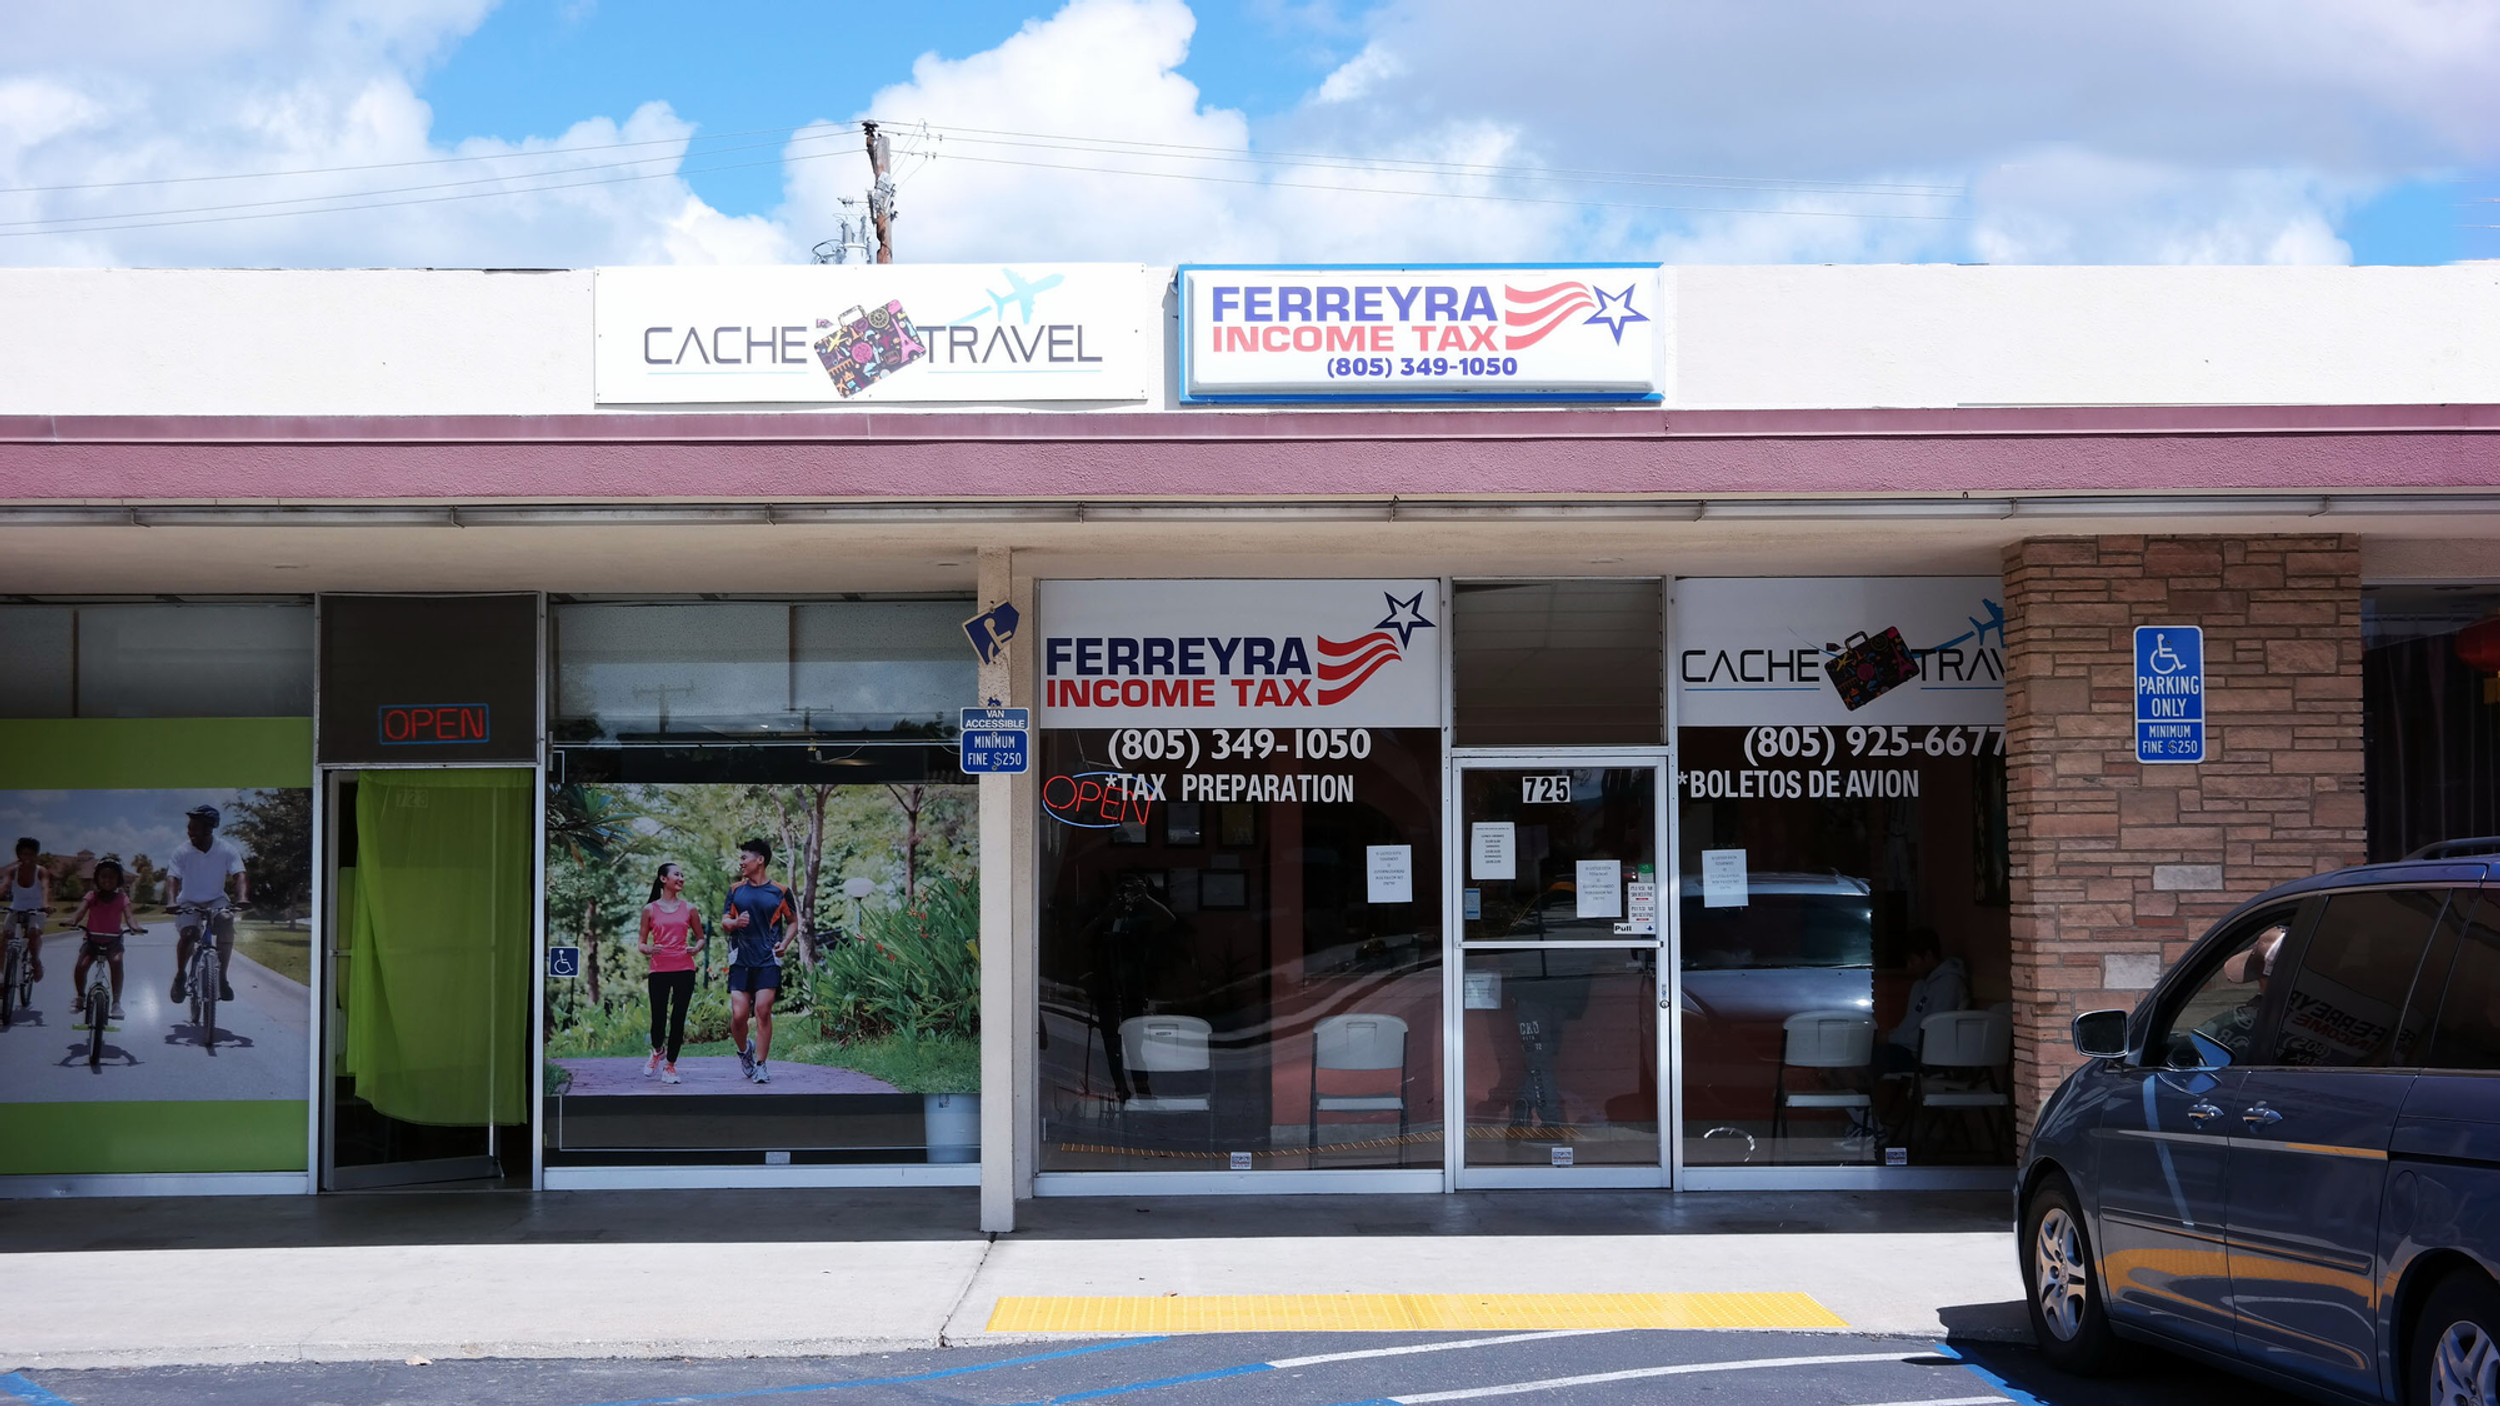 Ferreyra Income Tax & Cache Travel logo